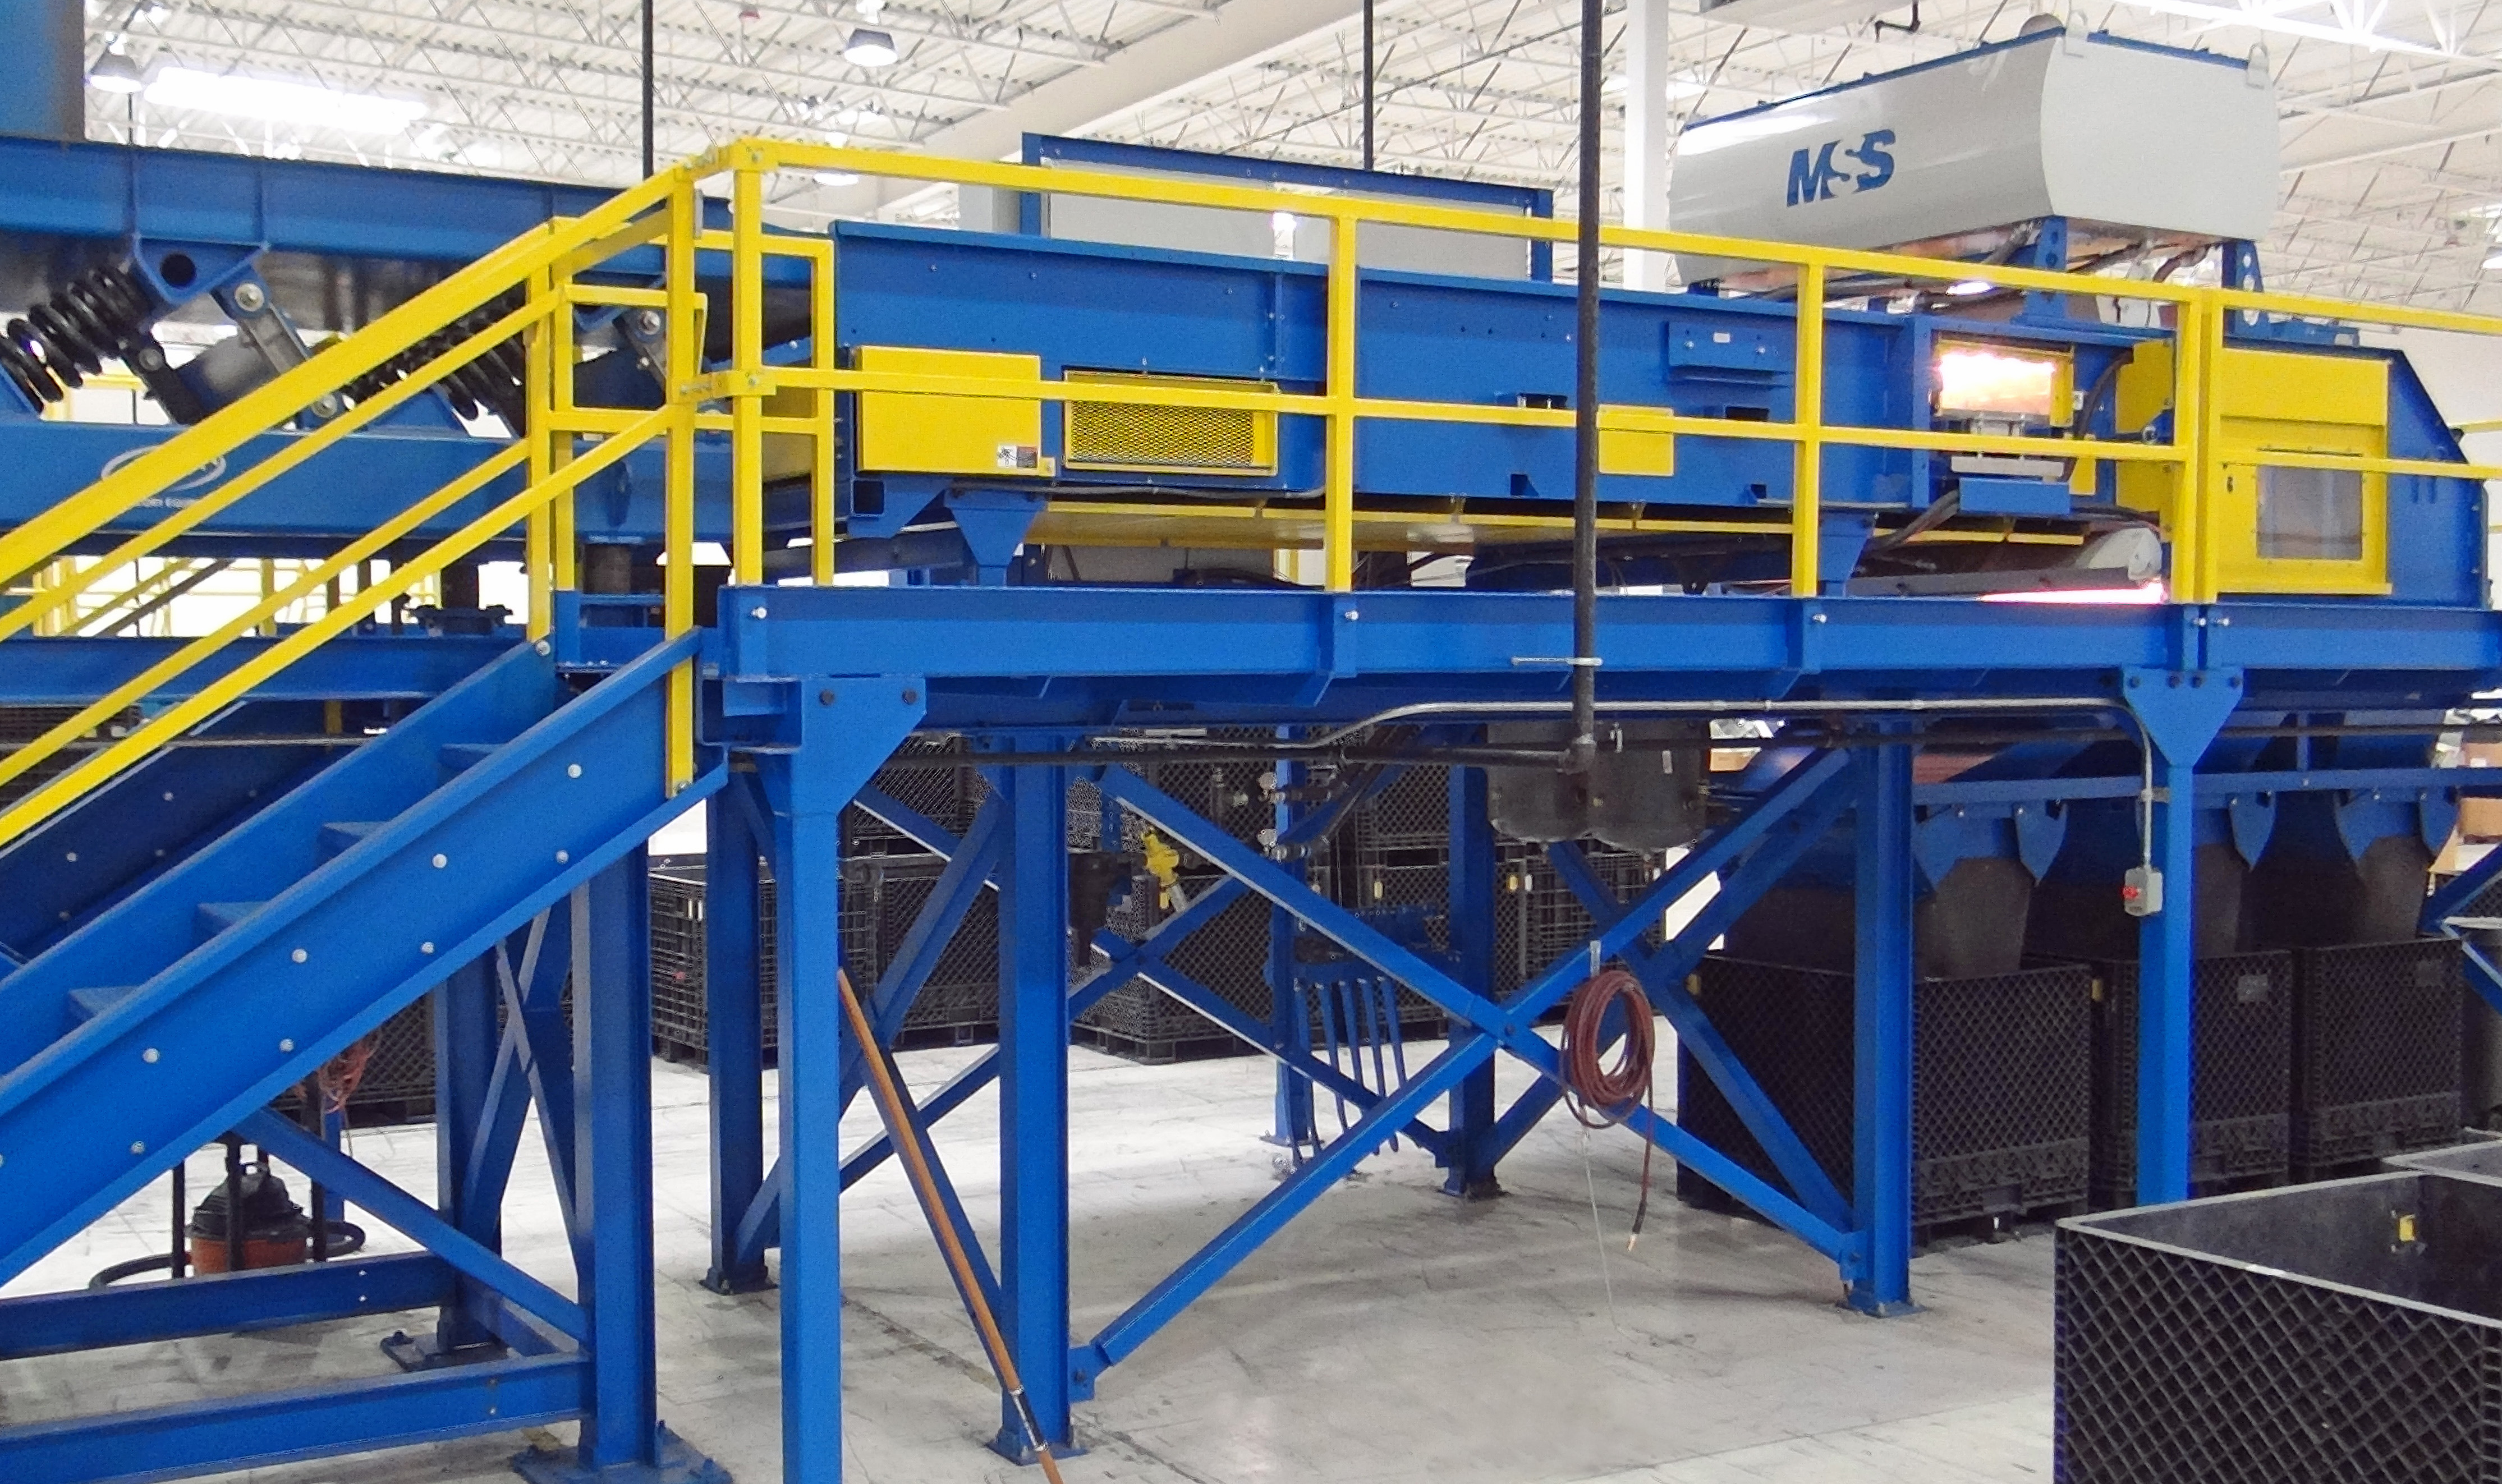 CIRRUS® optical sorter recycling